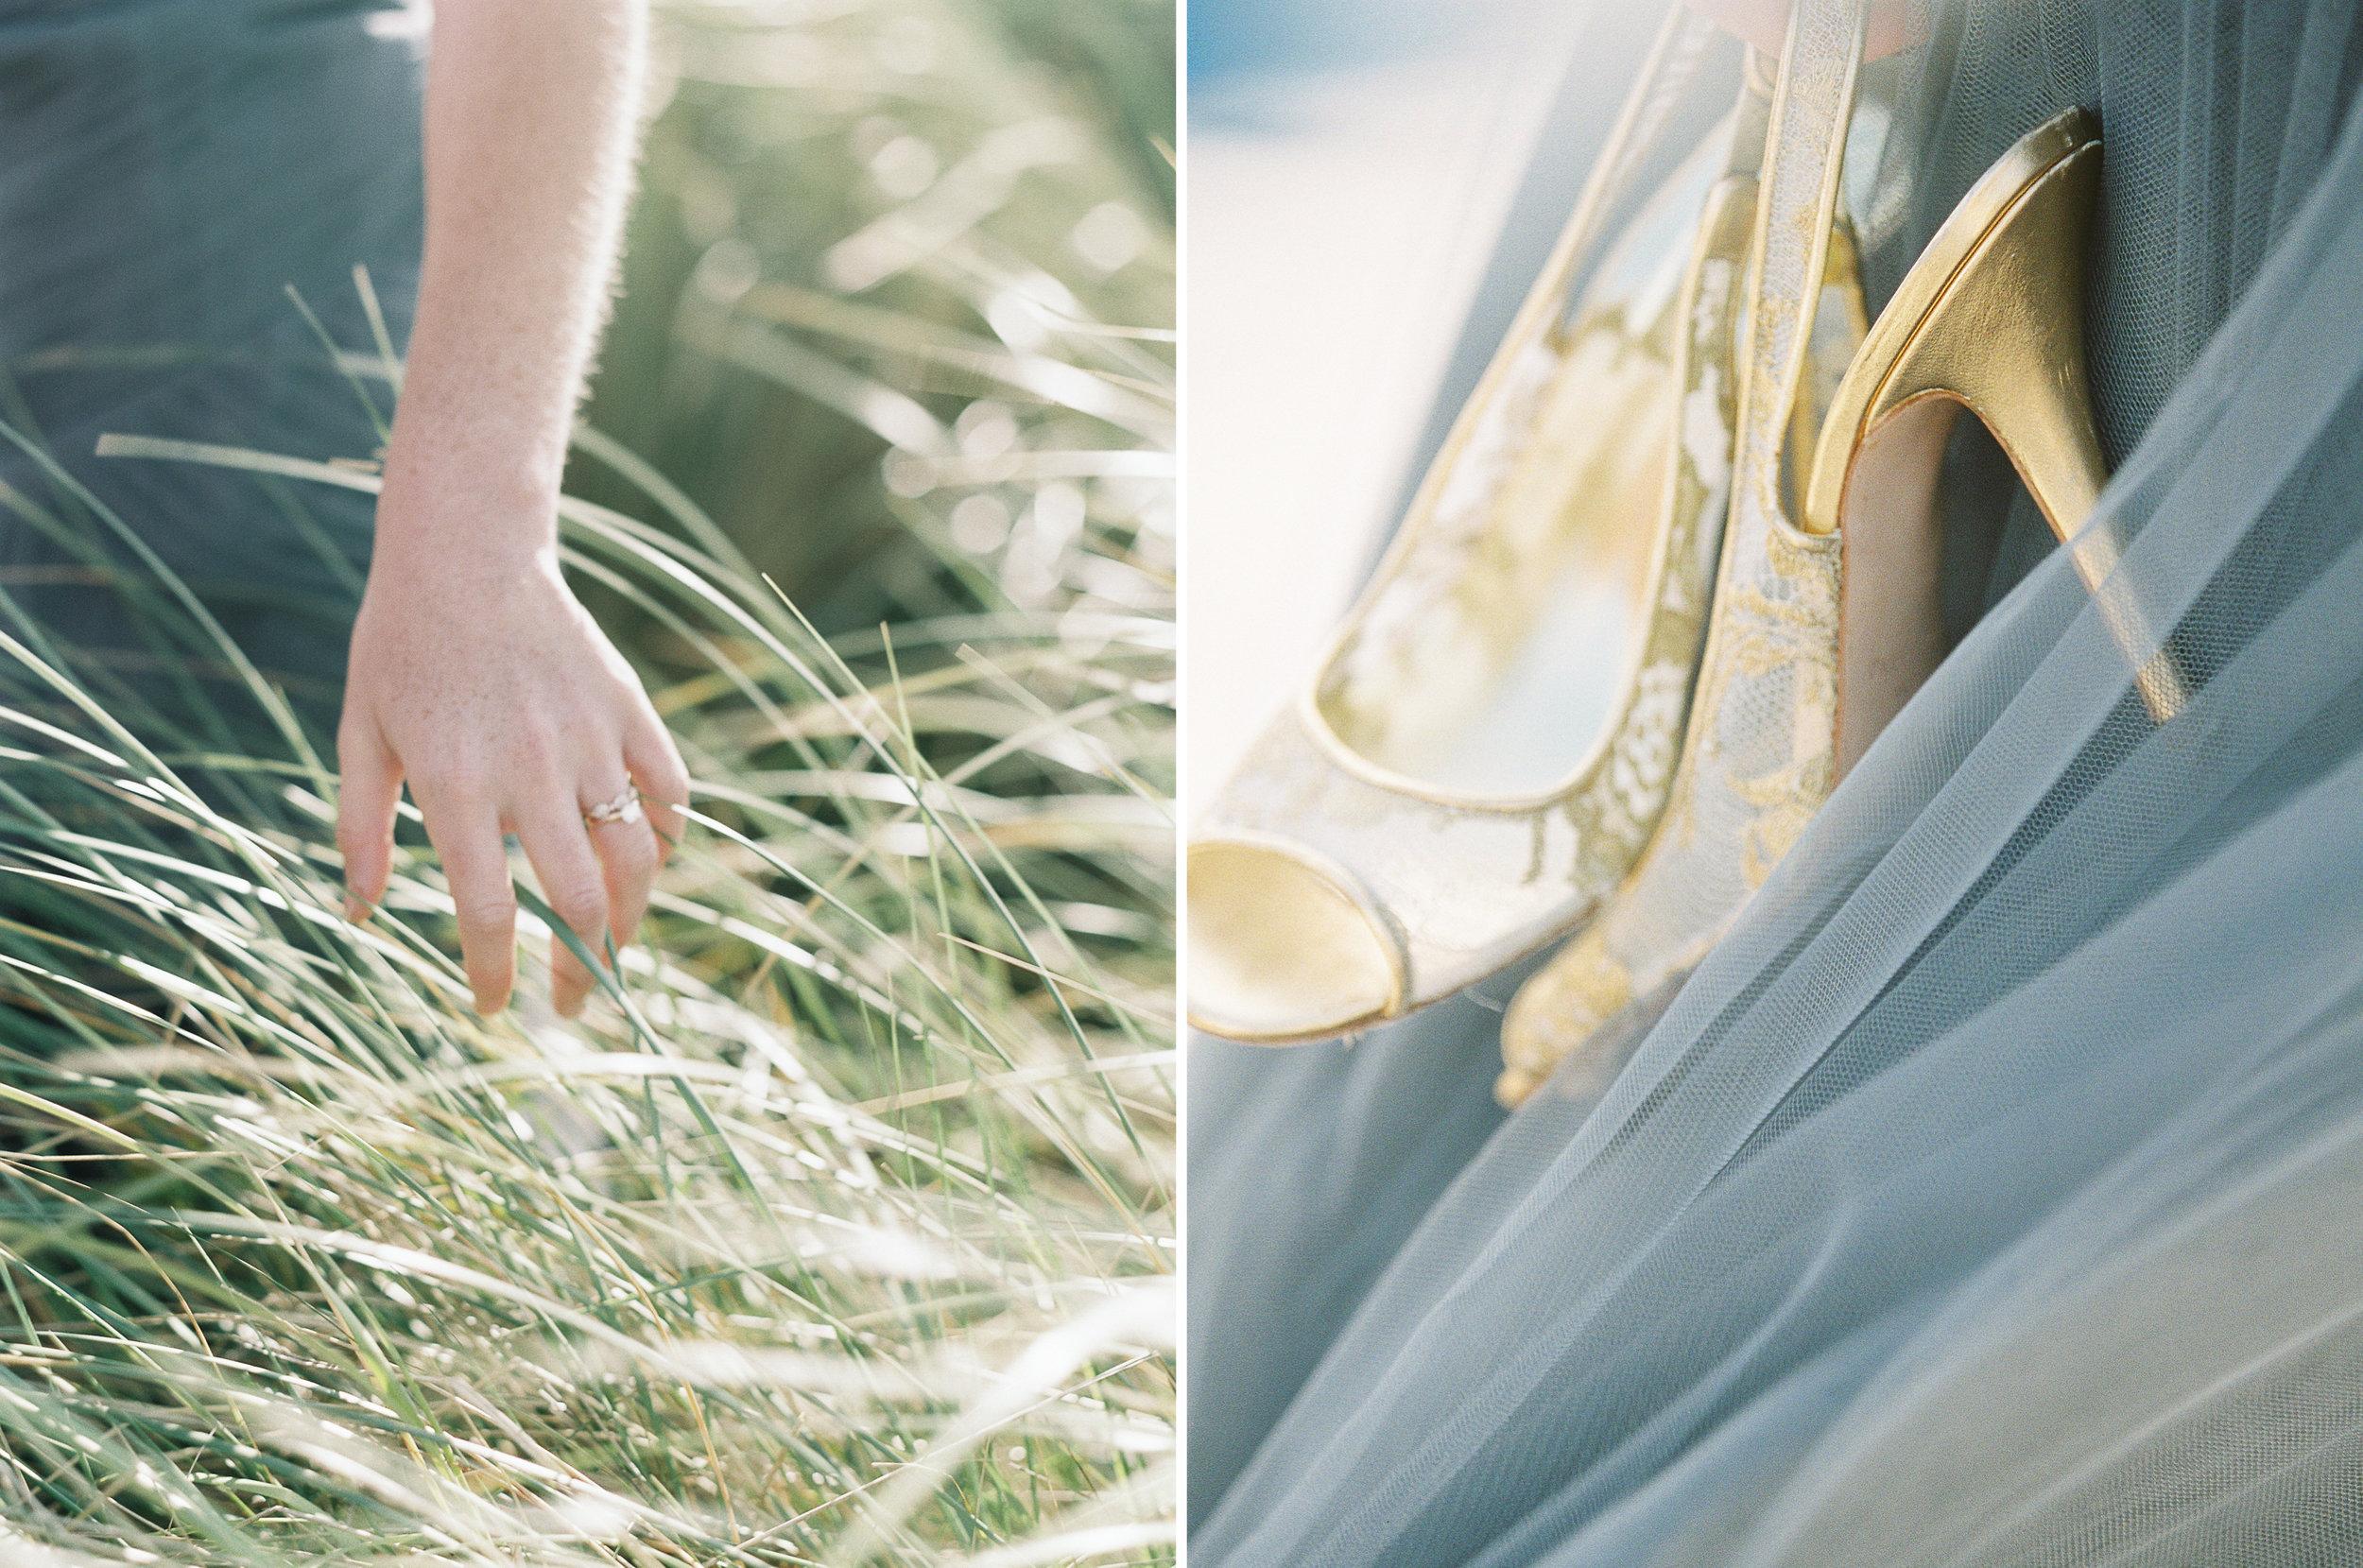 Chen-Sands-Film-Photography-Portraits-Engagement-Elopment-Ireland-Diptych-2.jpg